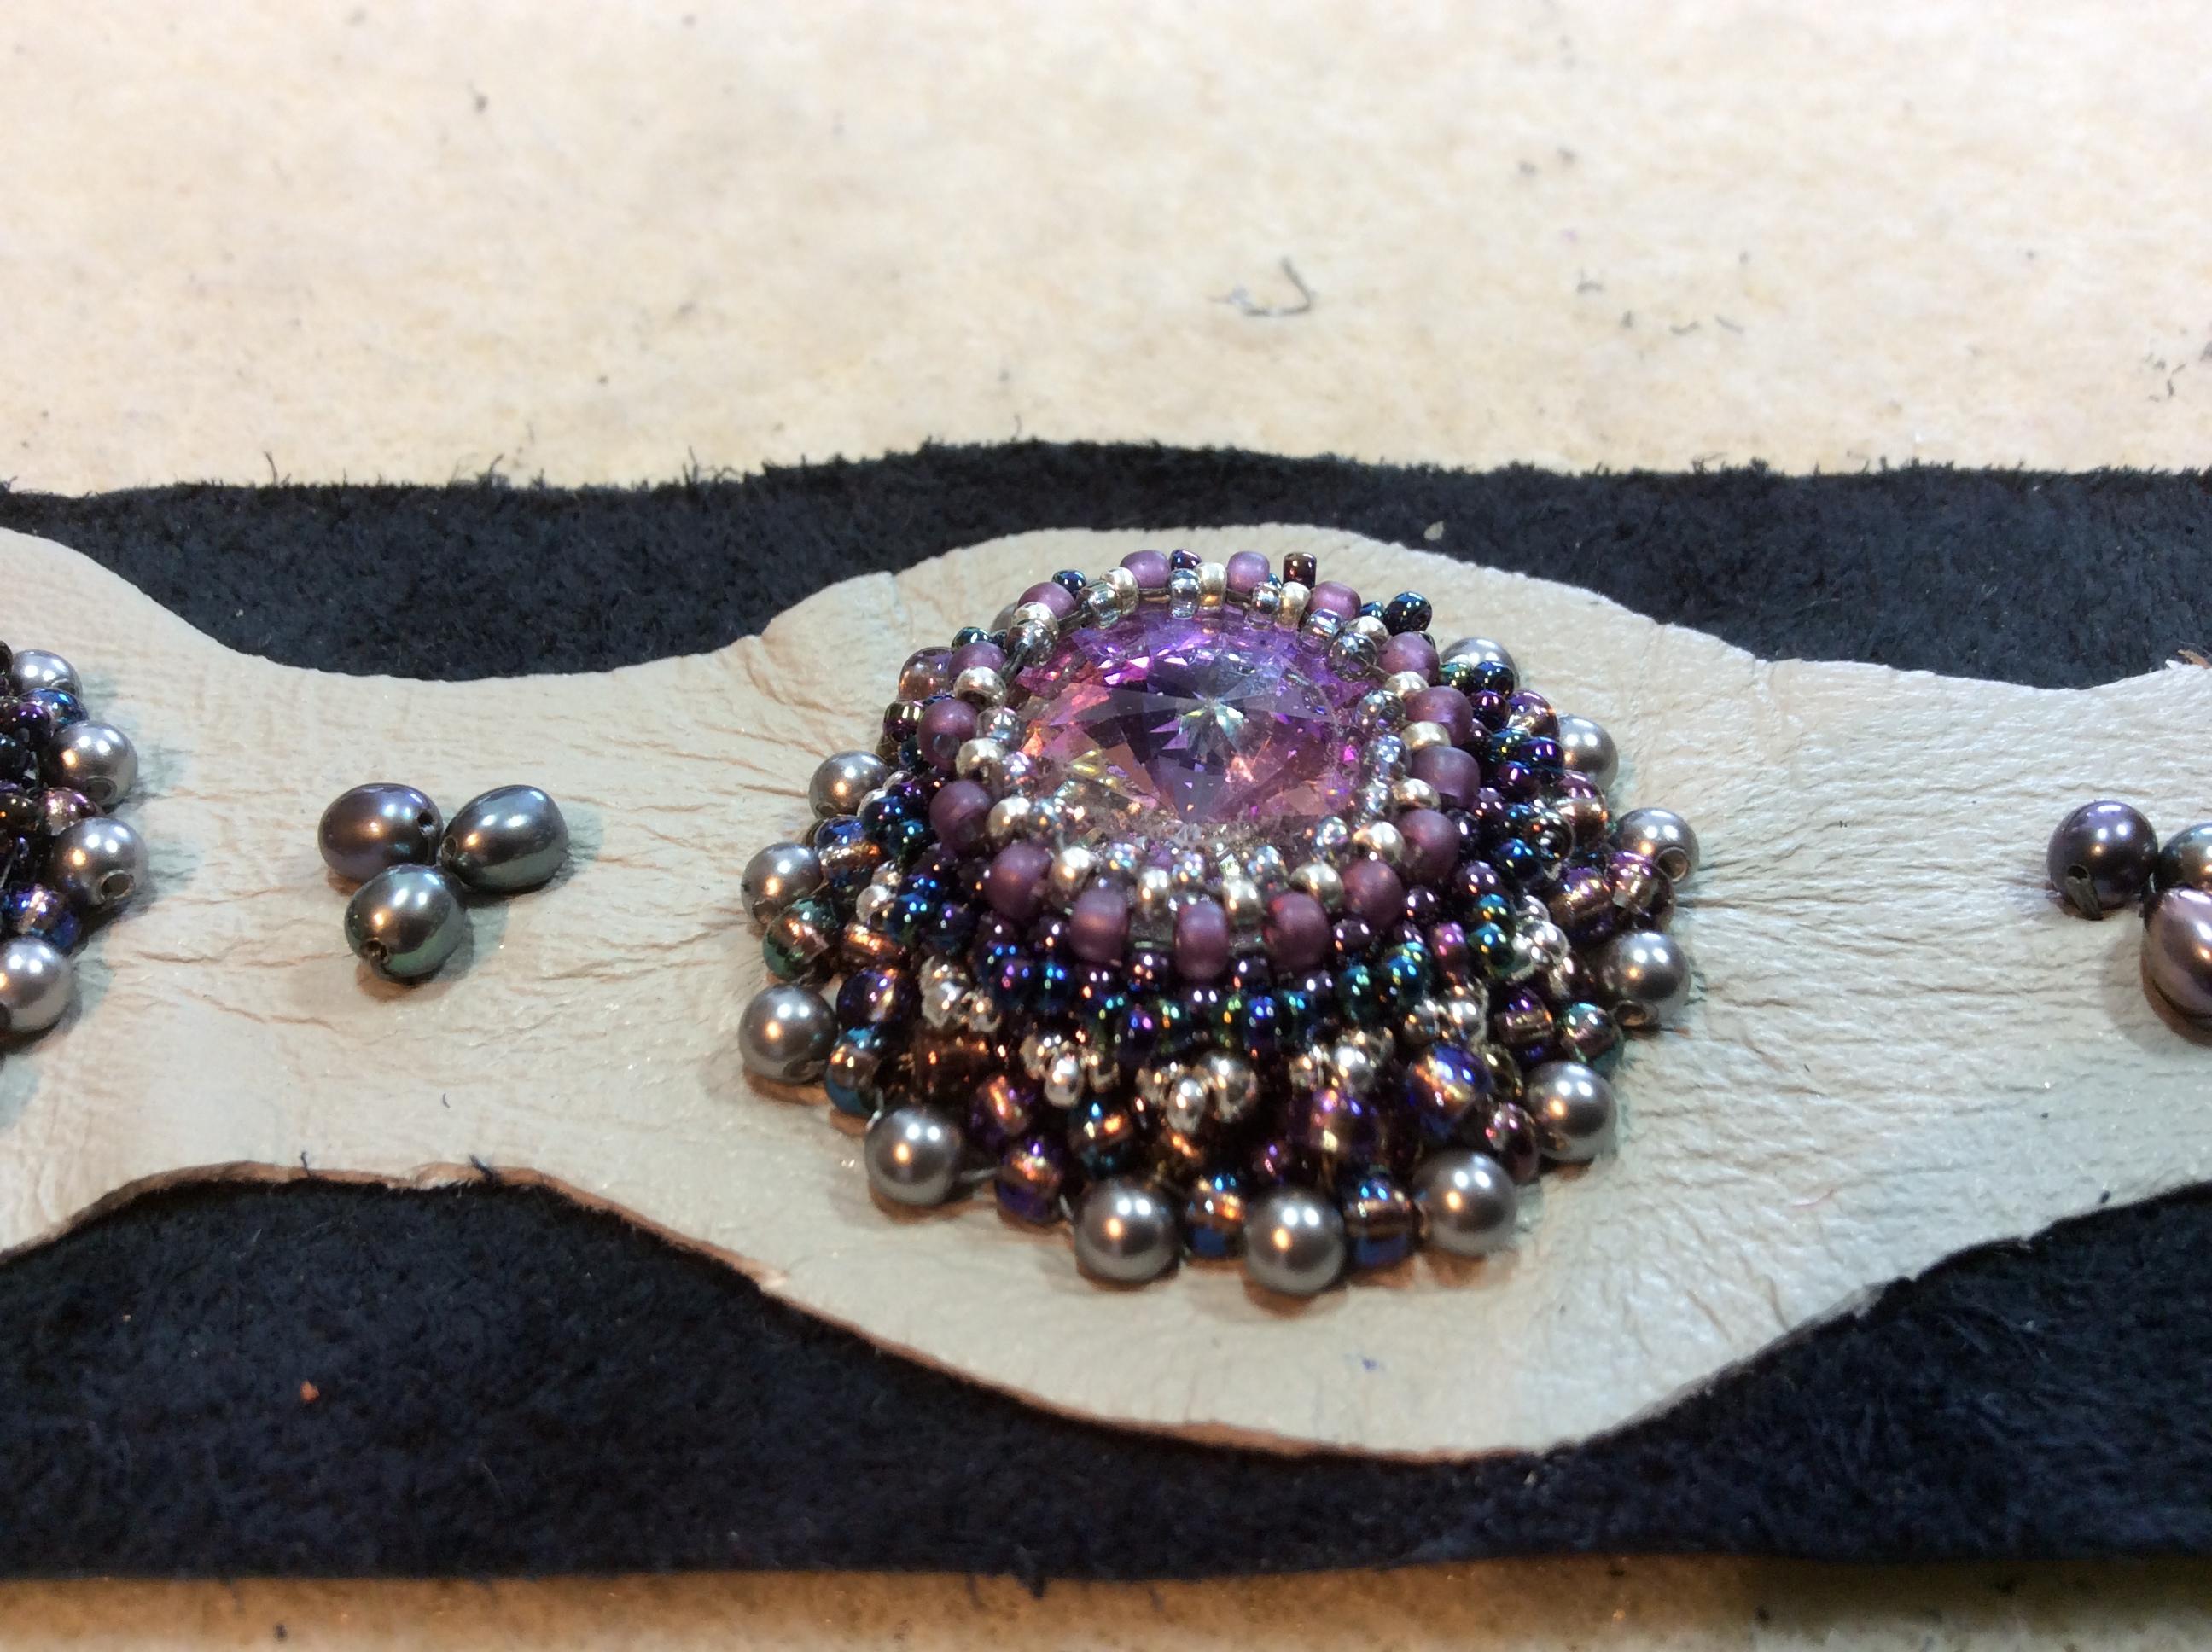 Wrok in Progress - Embroidered Cuff